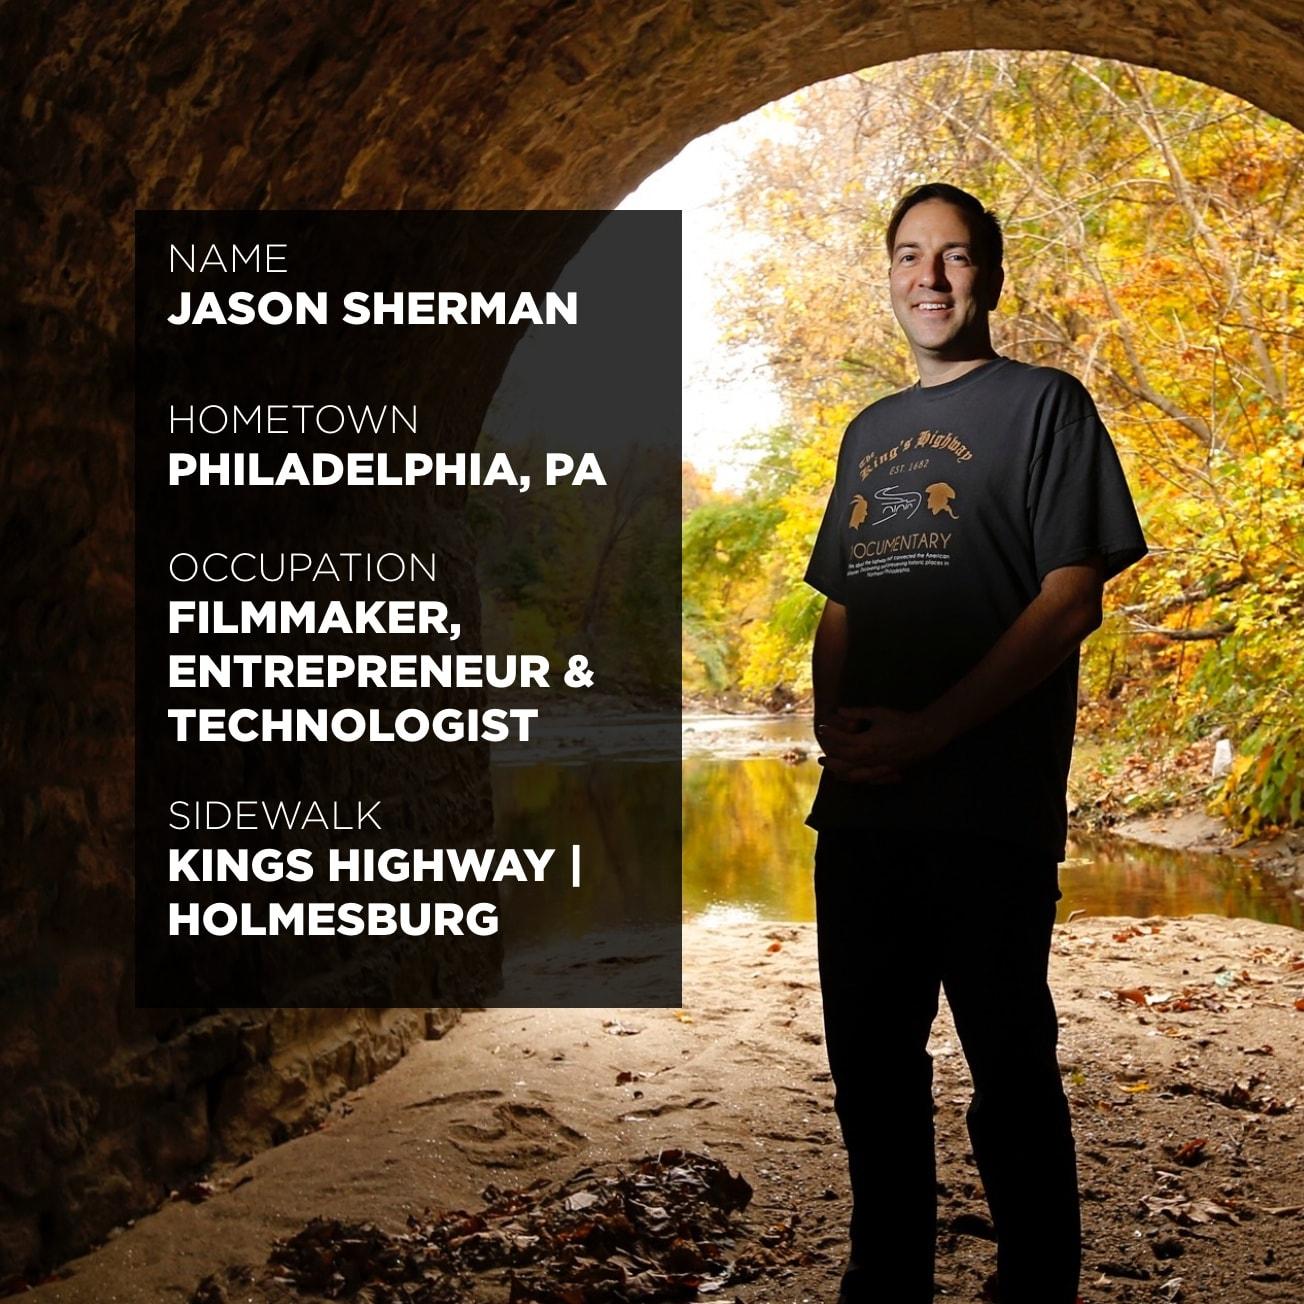 Jason Sherman_Word On the Street_Sidewalk-min.jpg